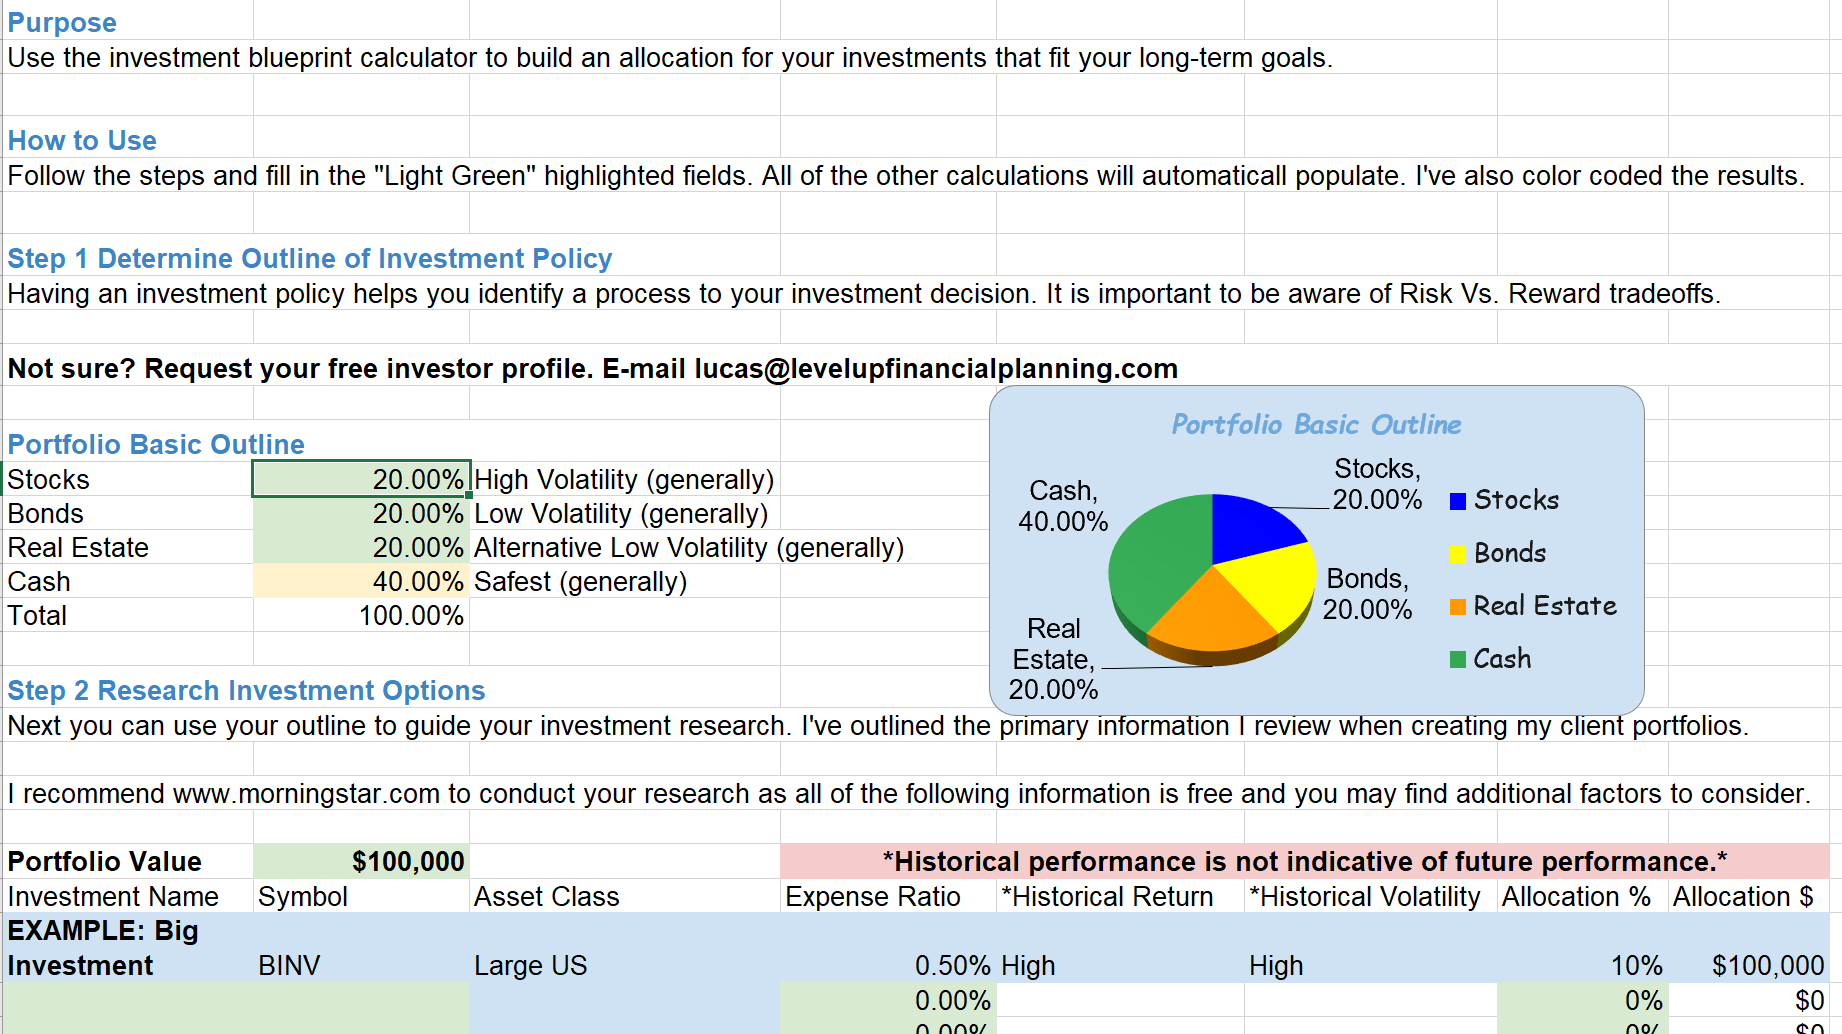 Investment Blueprint Image